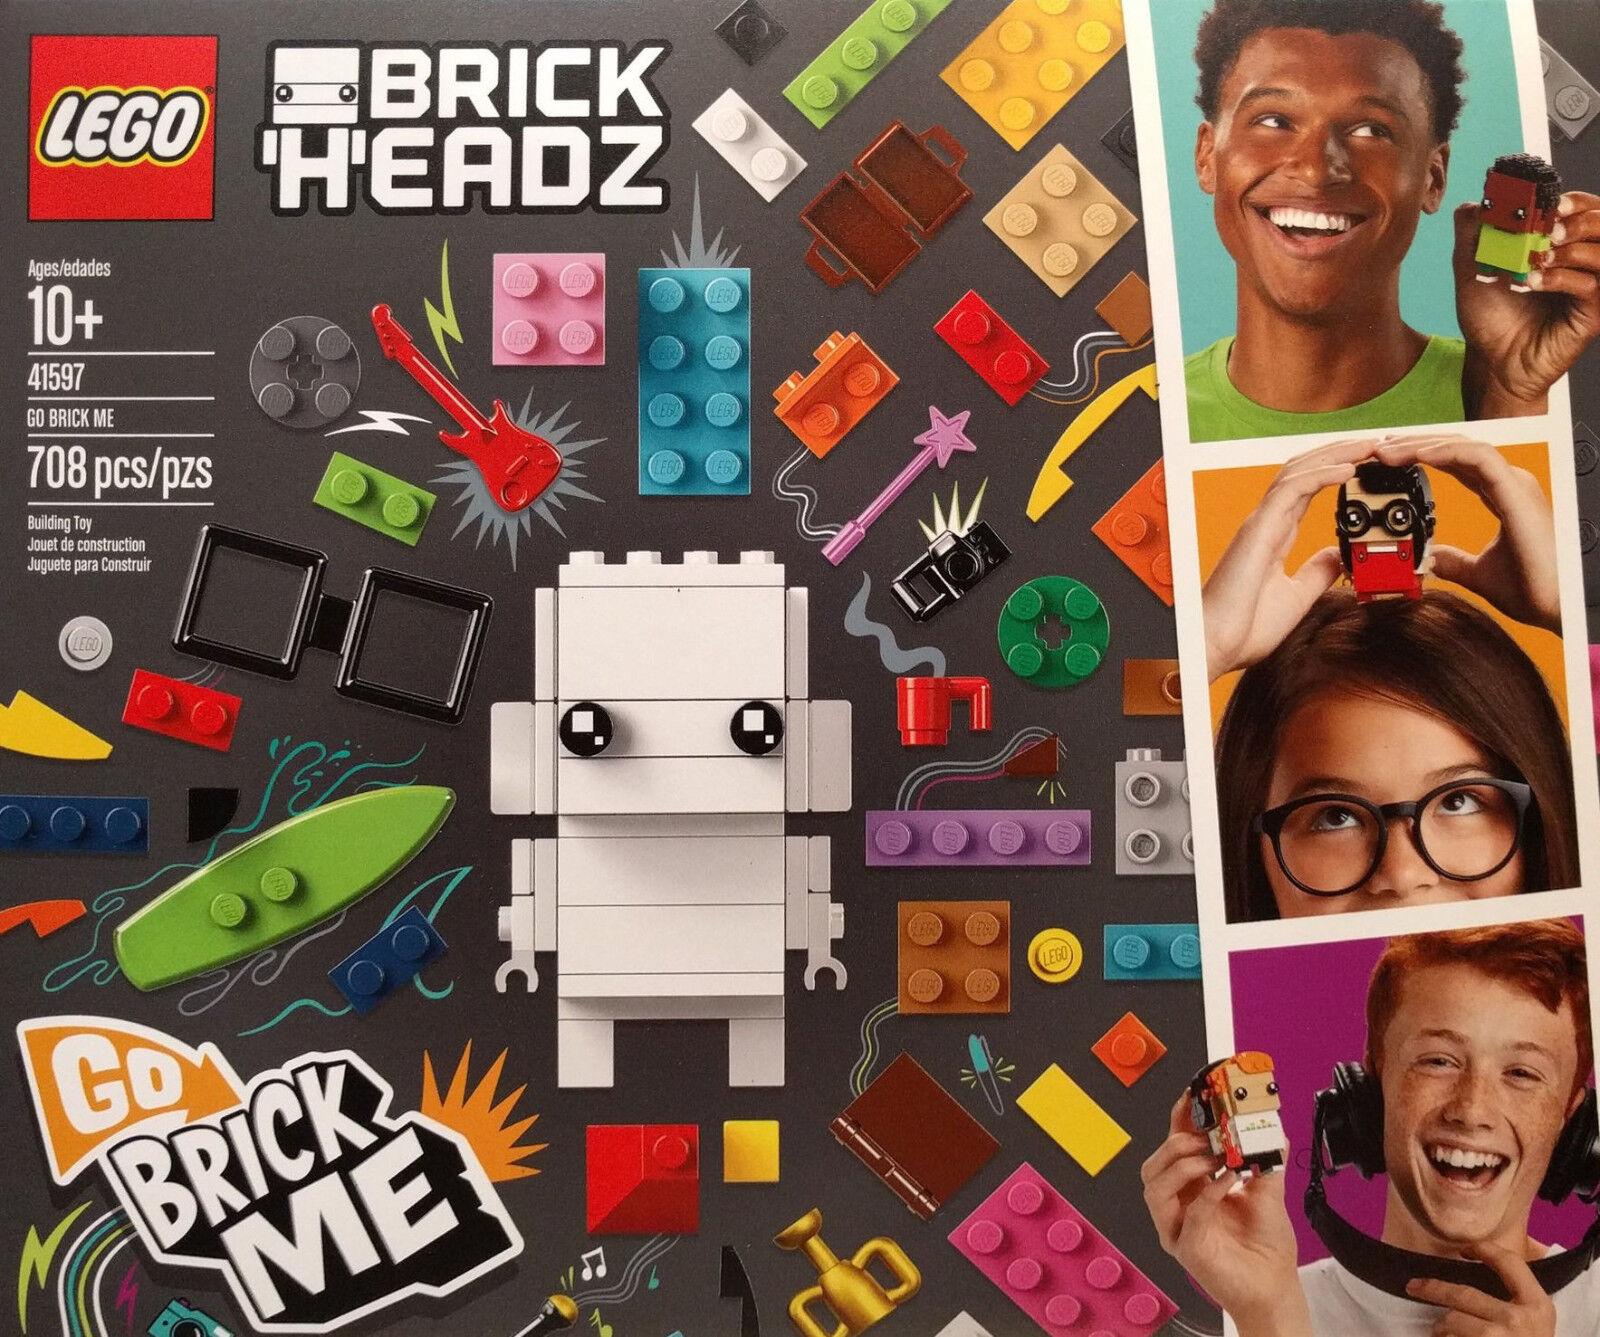 Lego brickheadz - 41597 Go Brick me-nuevo & OVP